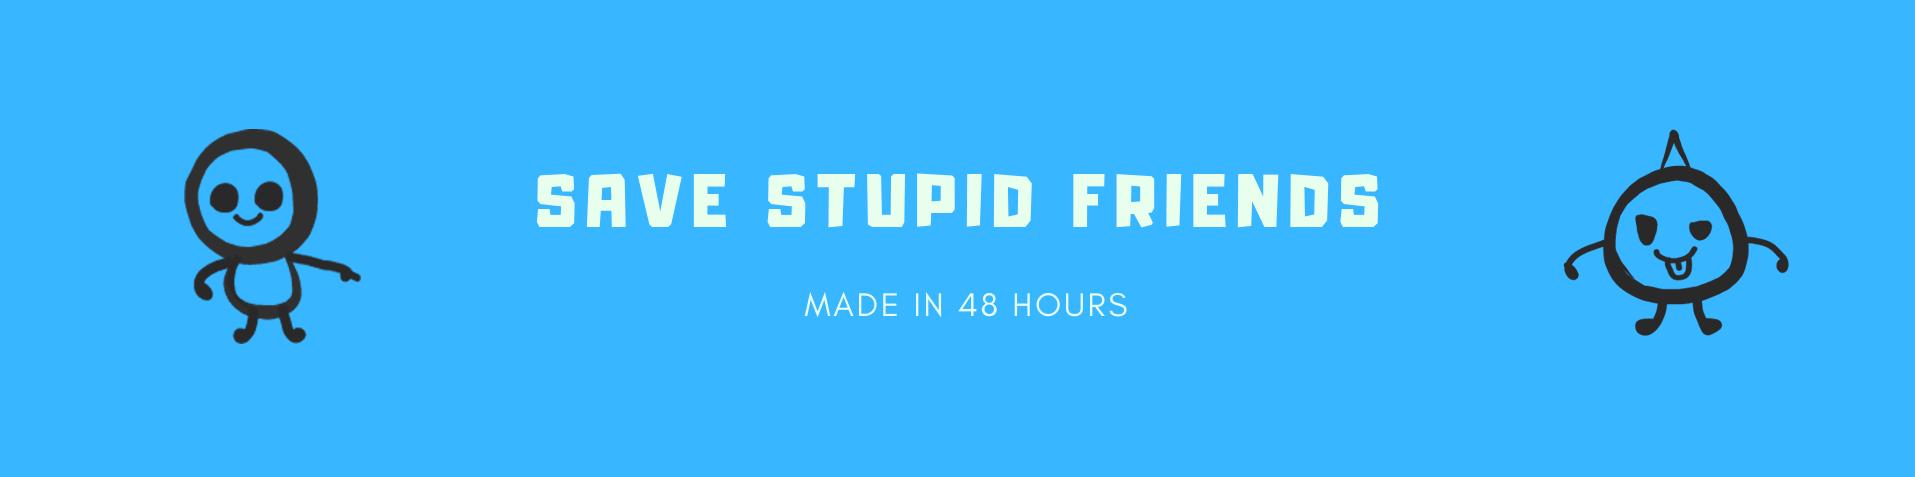 Save Stupid Friends